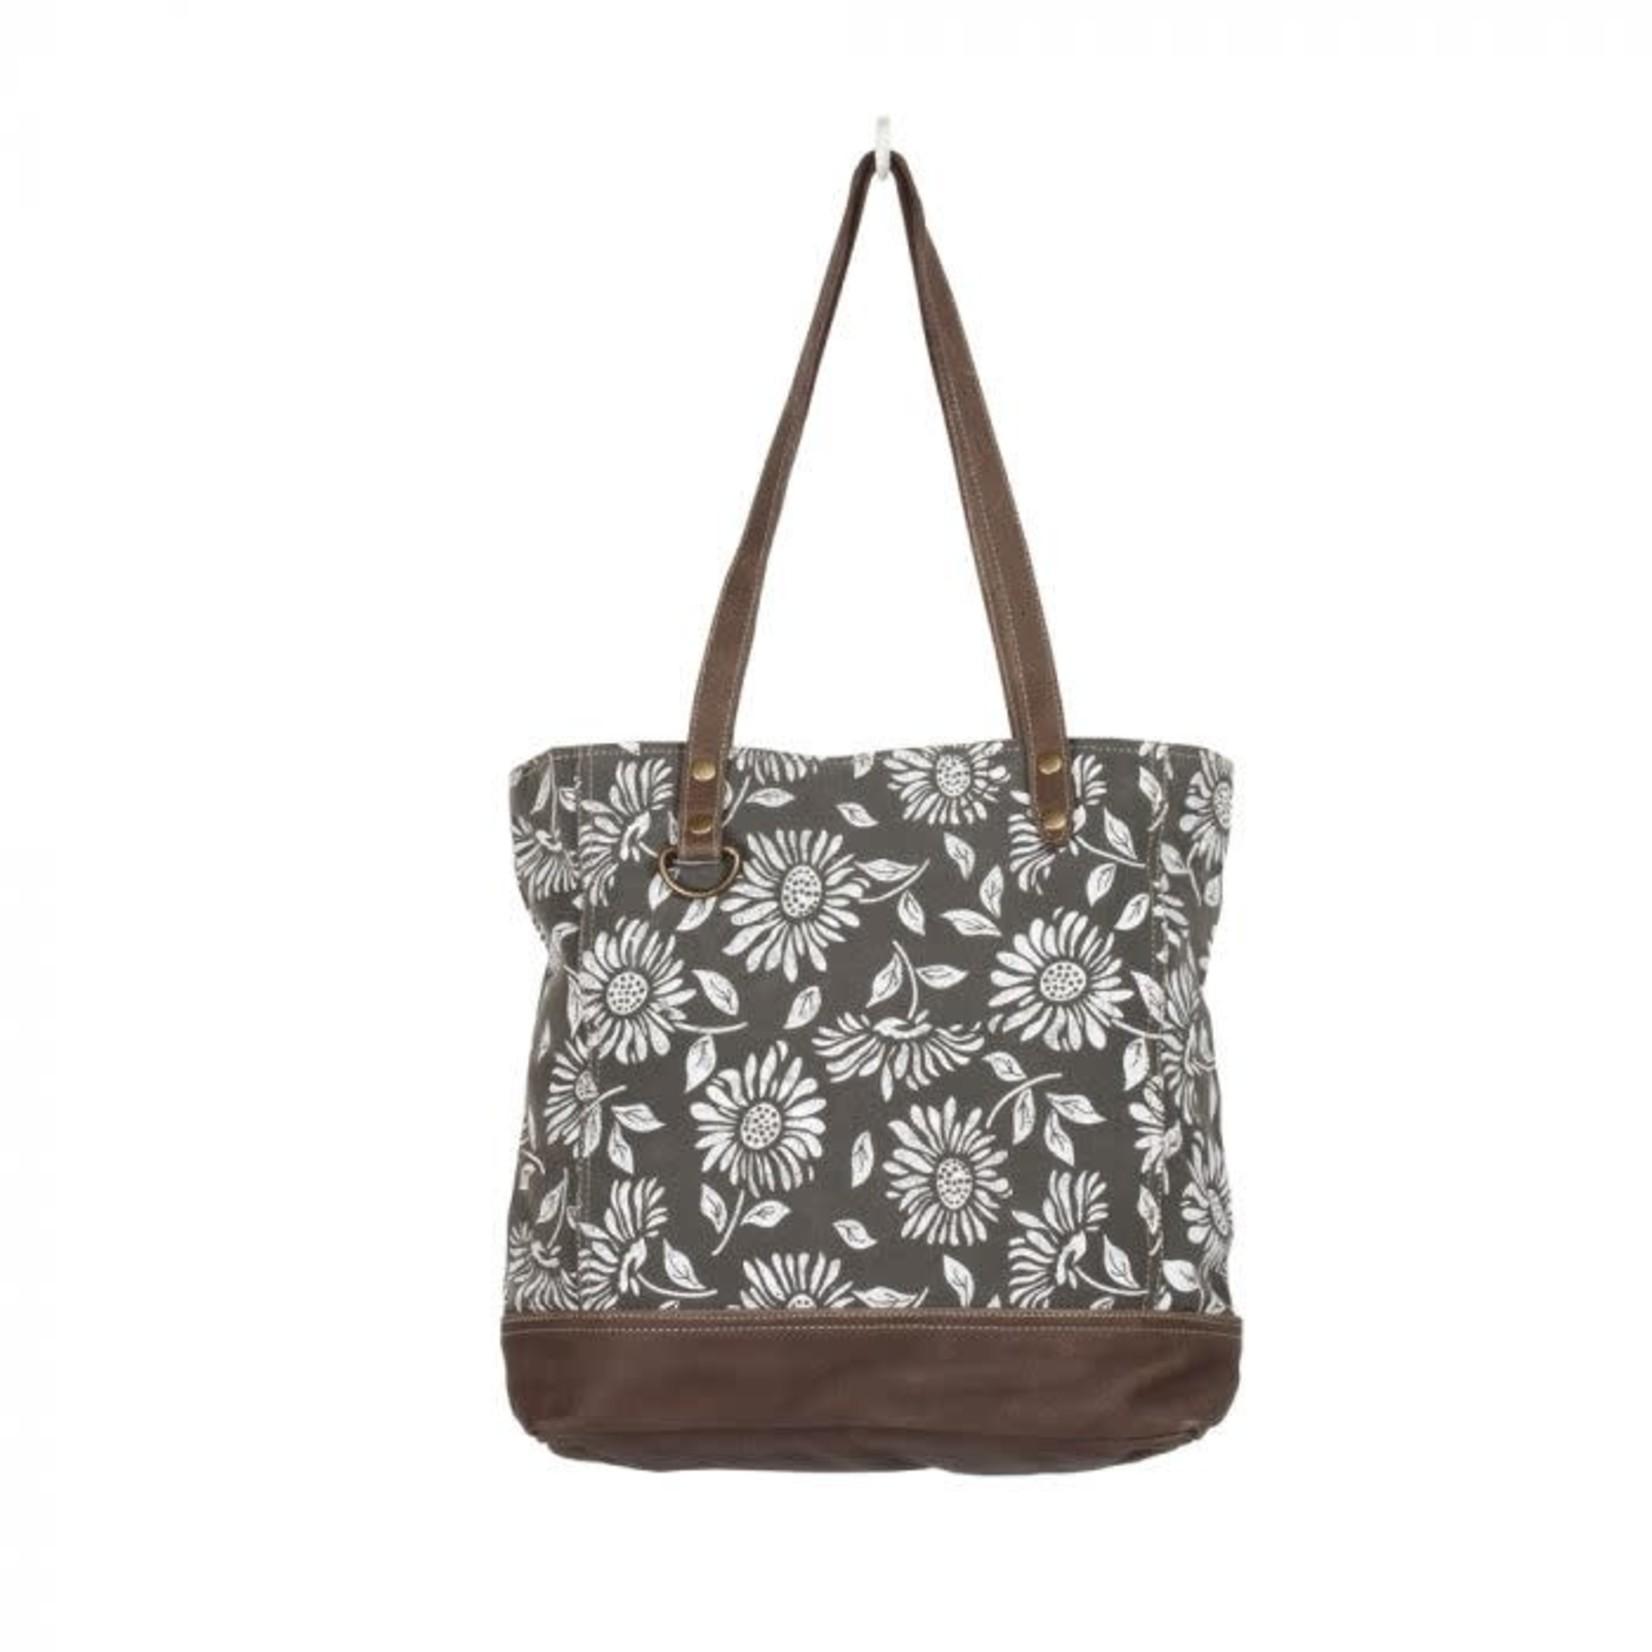 Myra Bag Bag: Great Nautical Tote